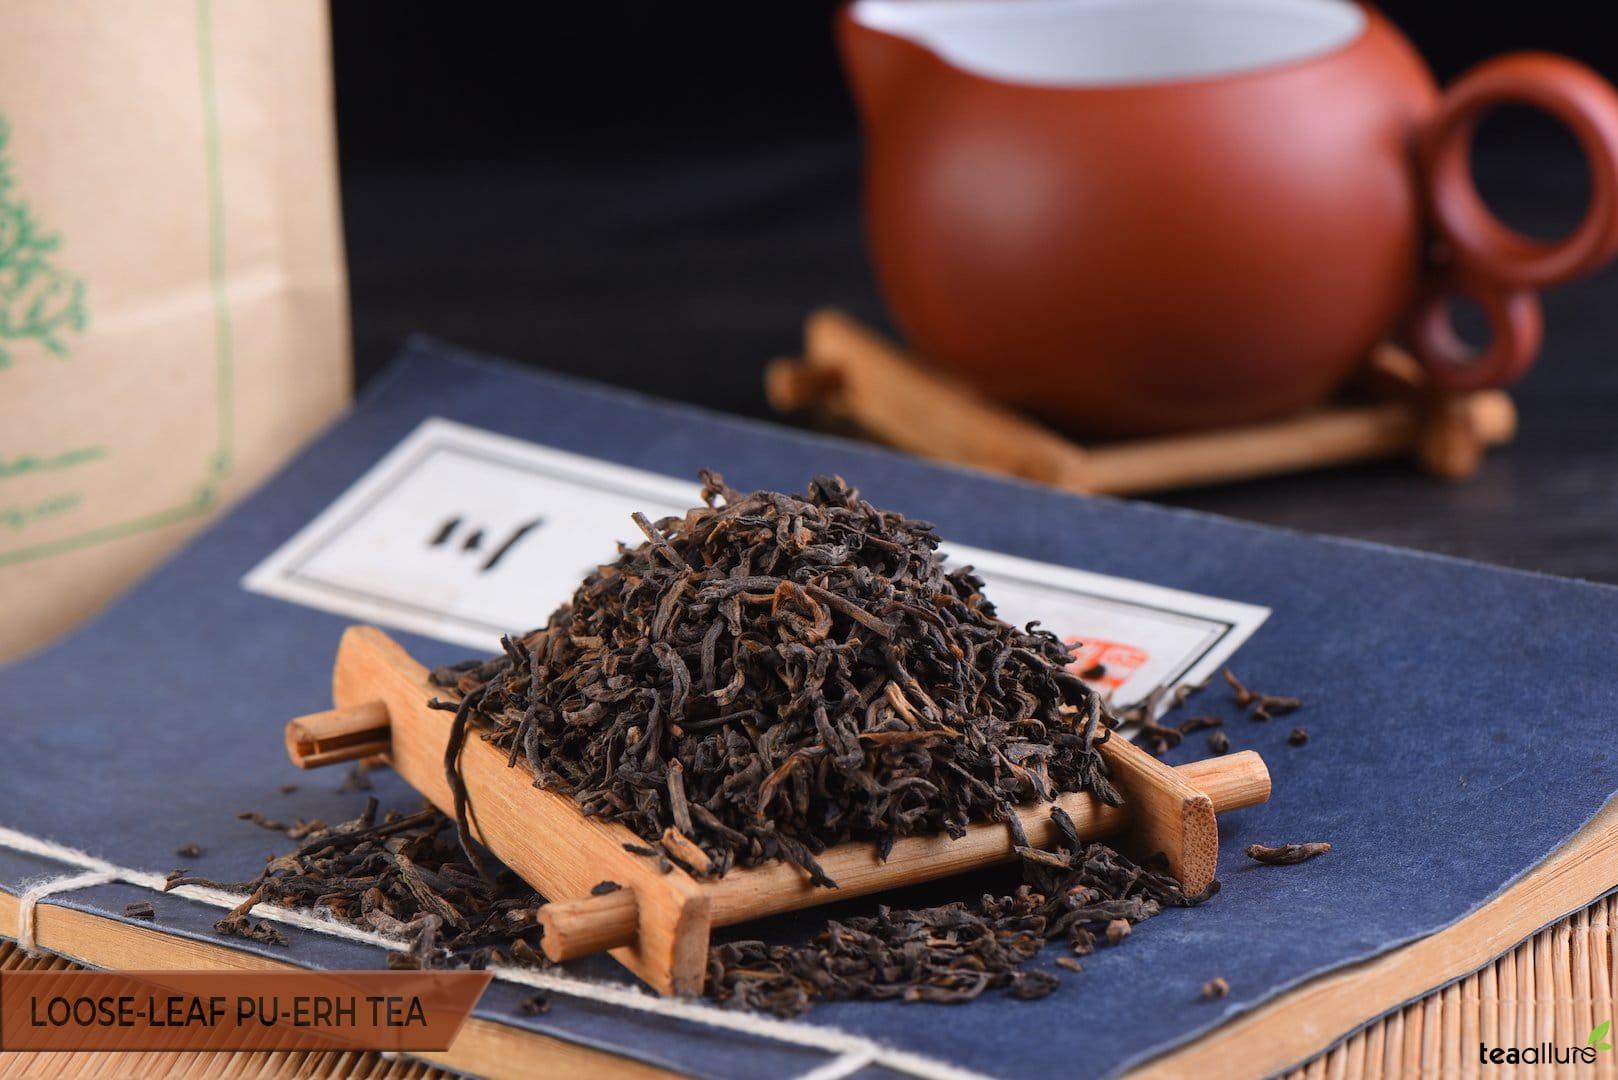 How to Brew Loose-leaf Pu-erh tea